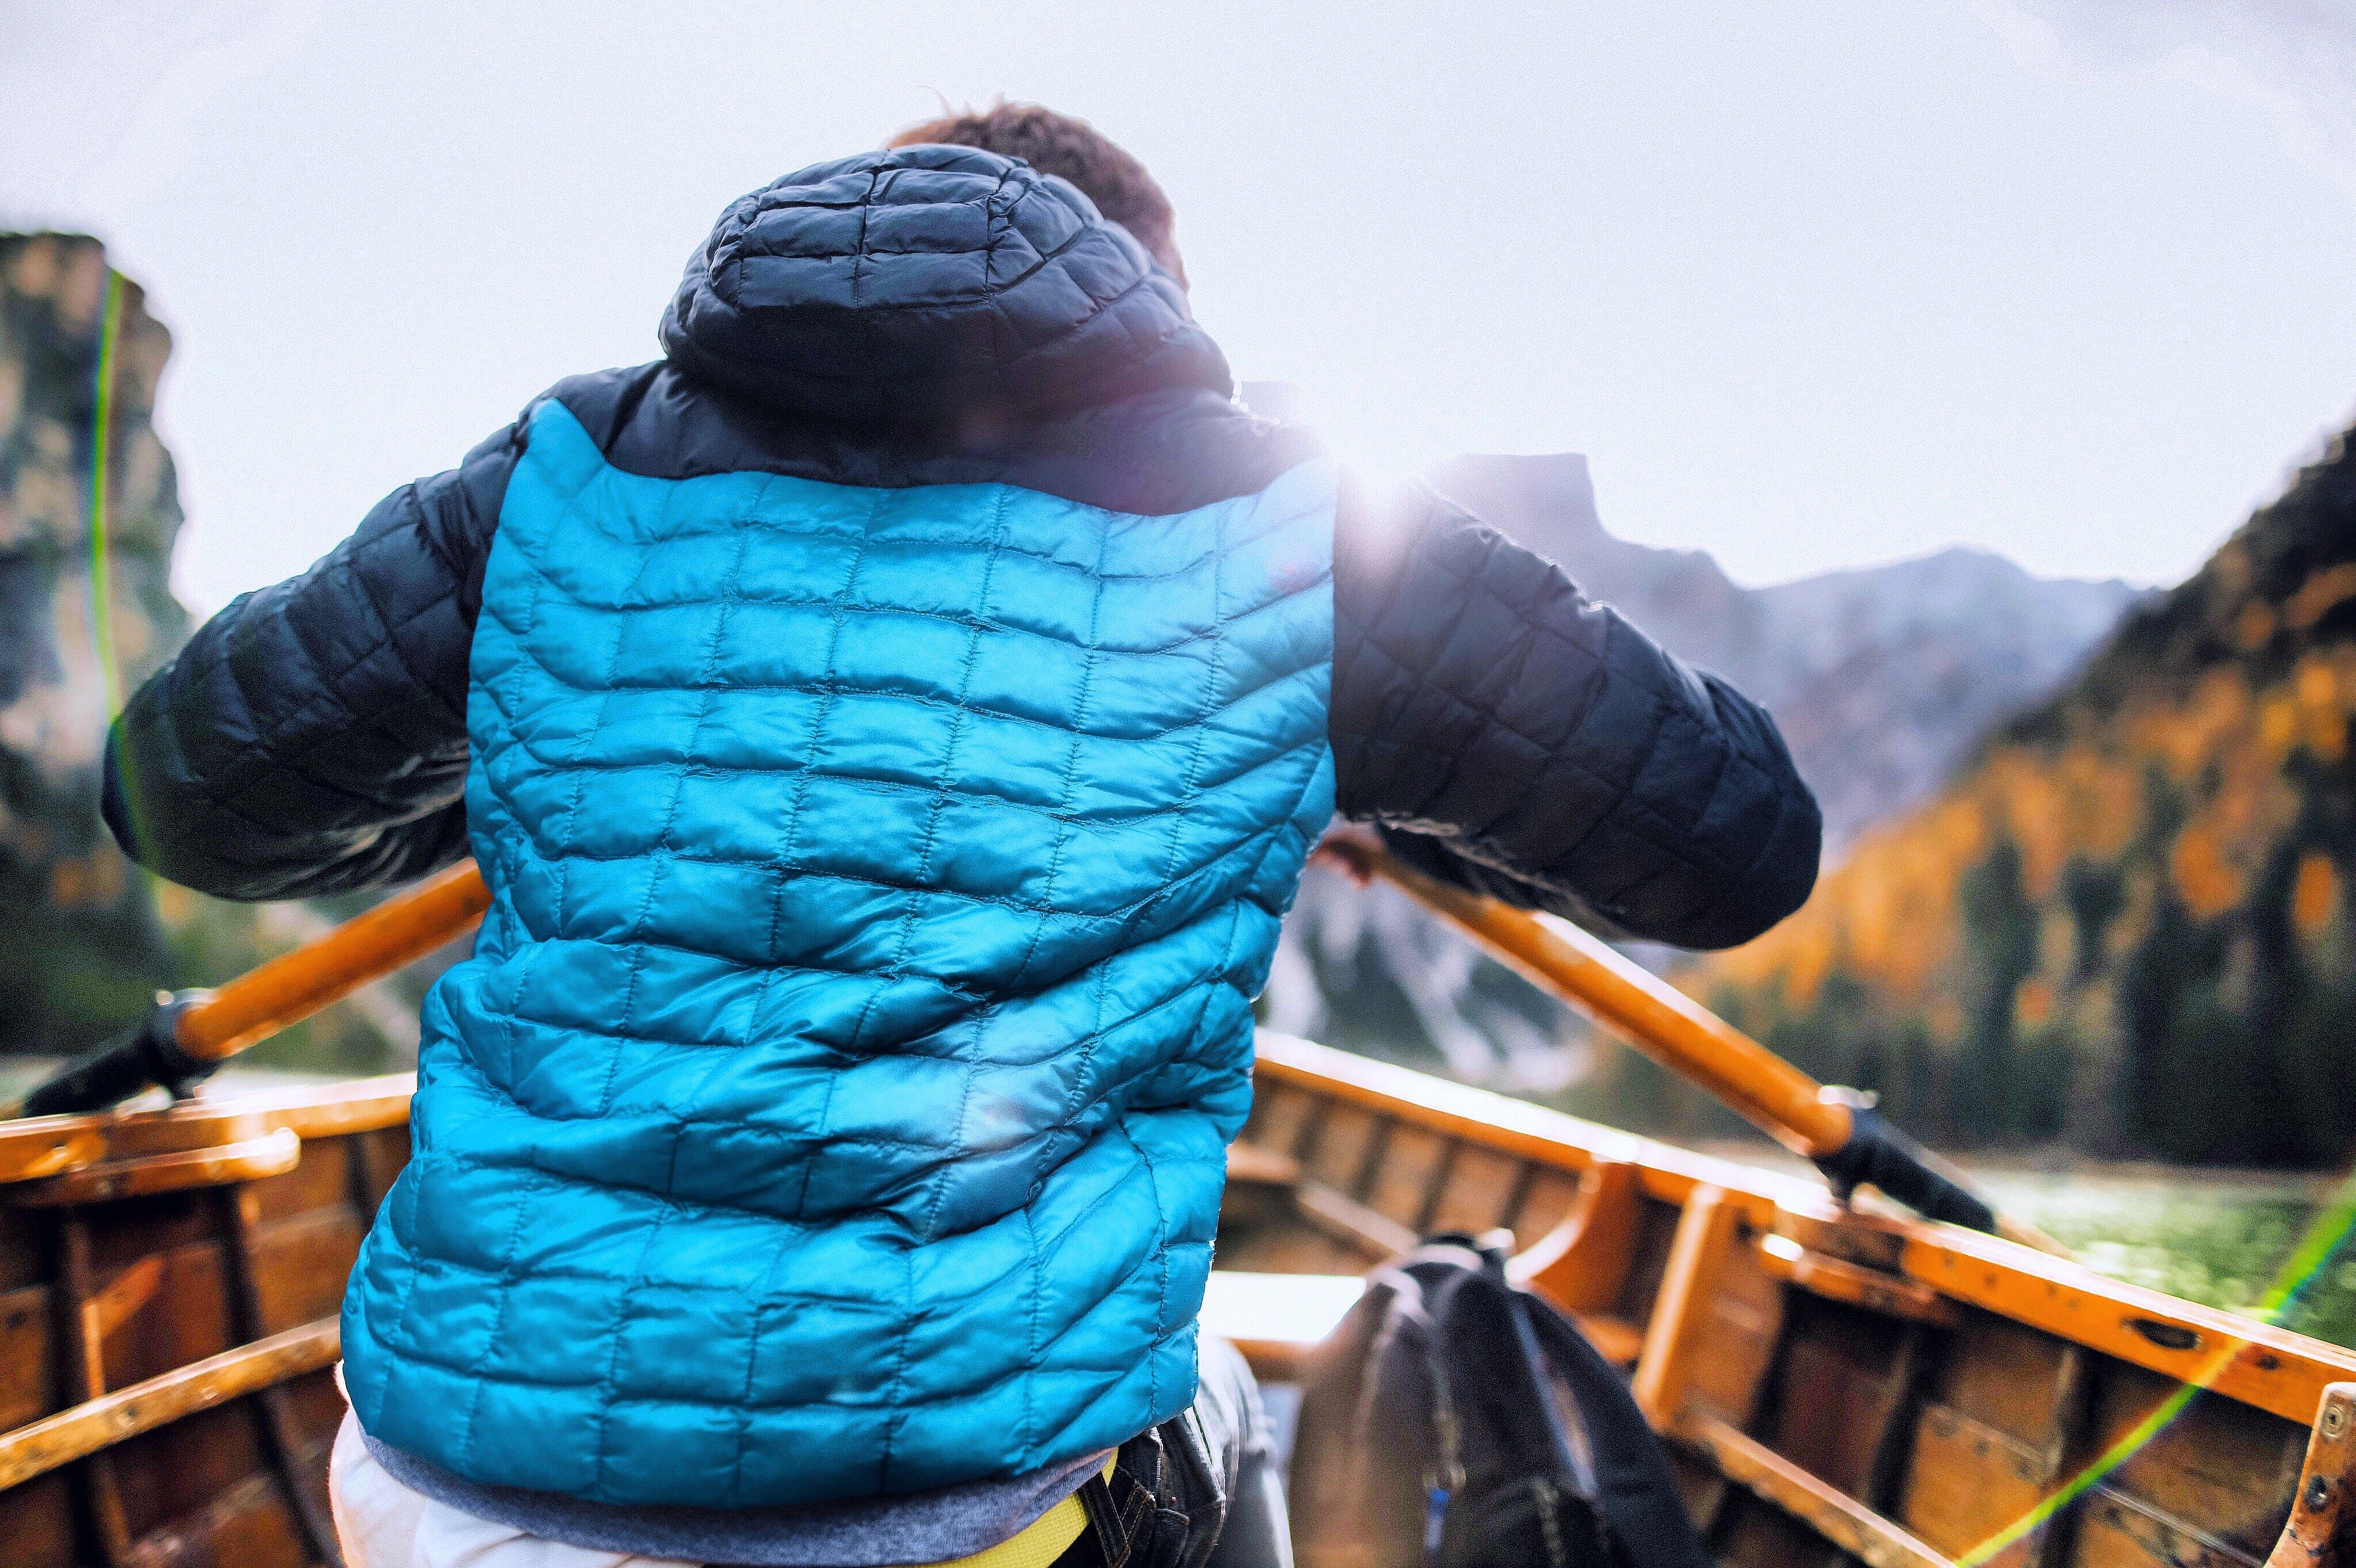 Man in Blue Vest Holding Paddle Sitting Inside Boat